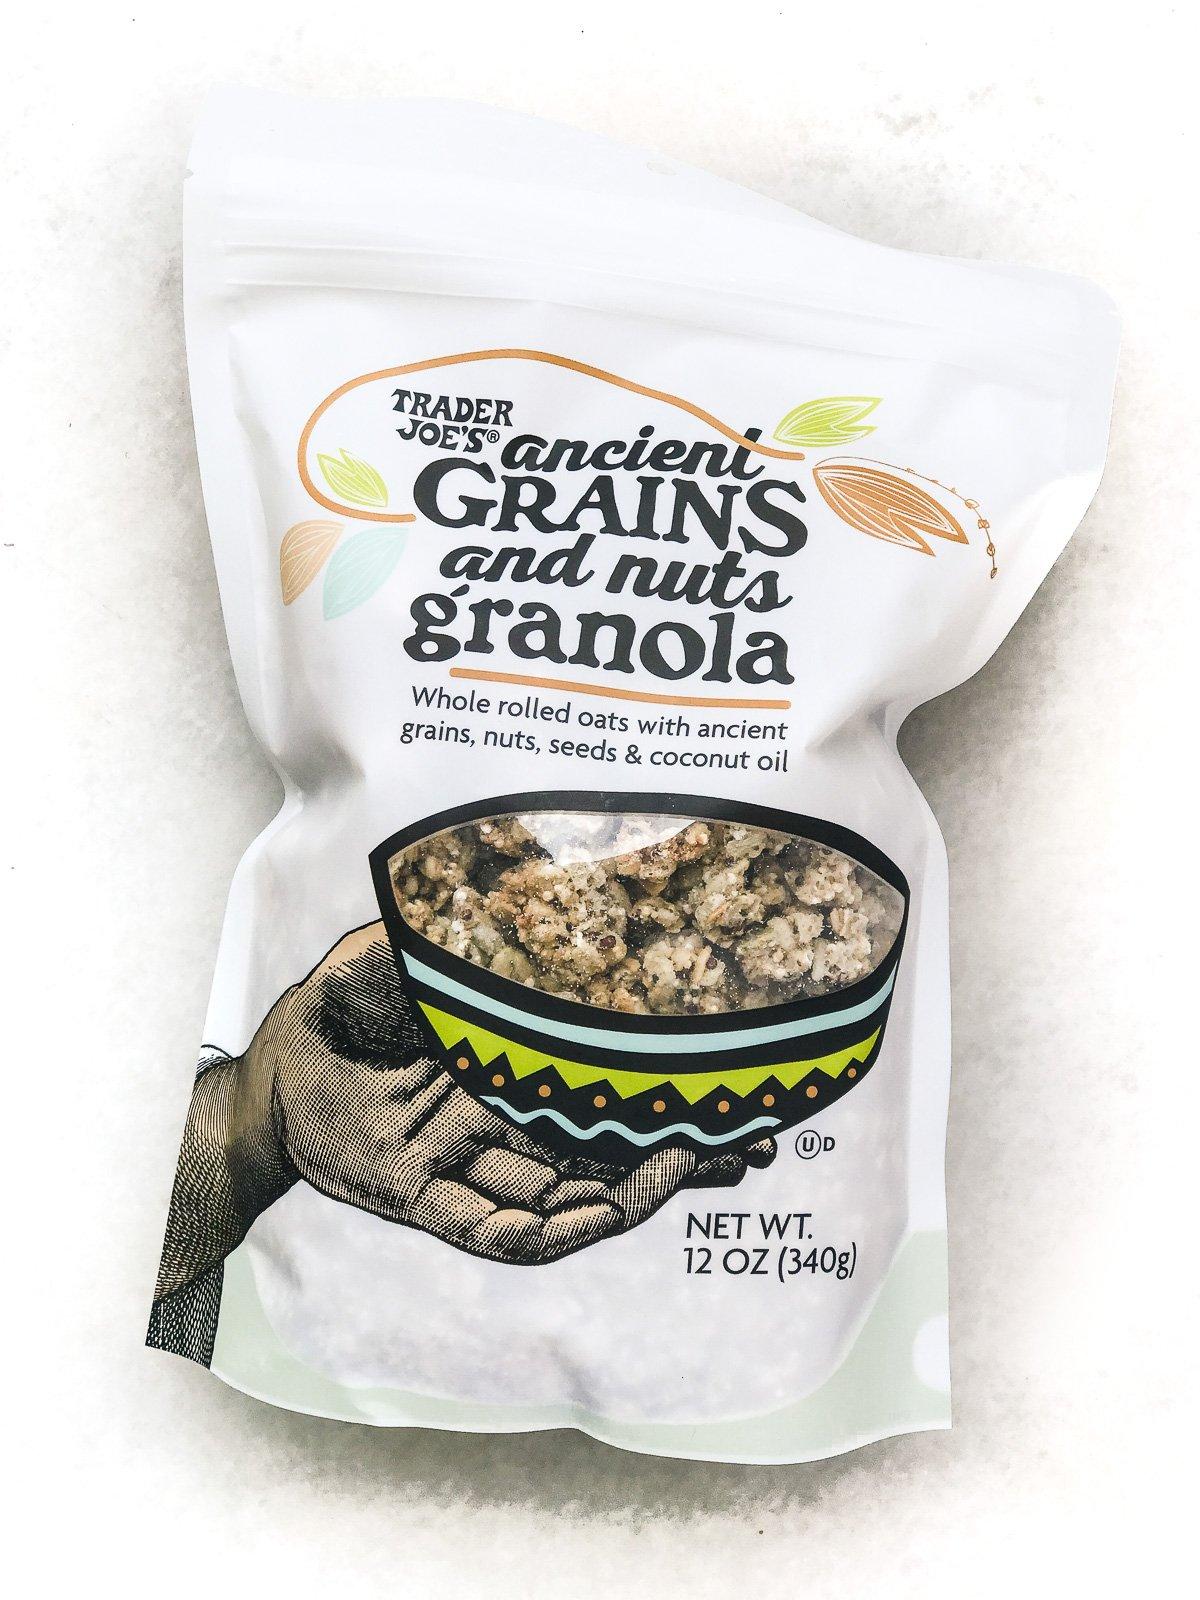 Trader Joe's granola